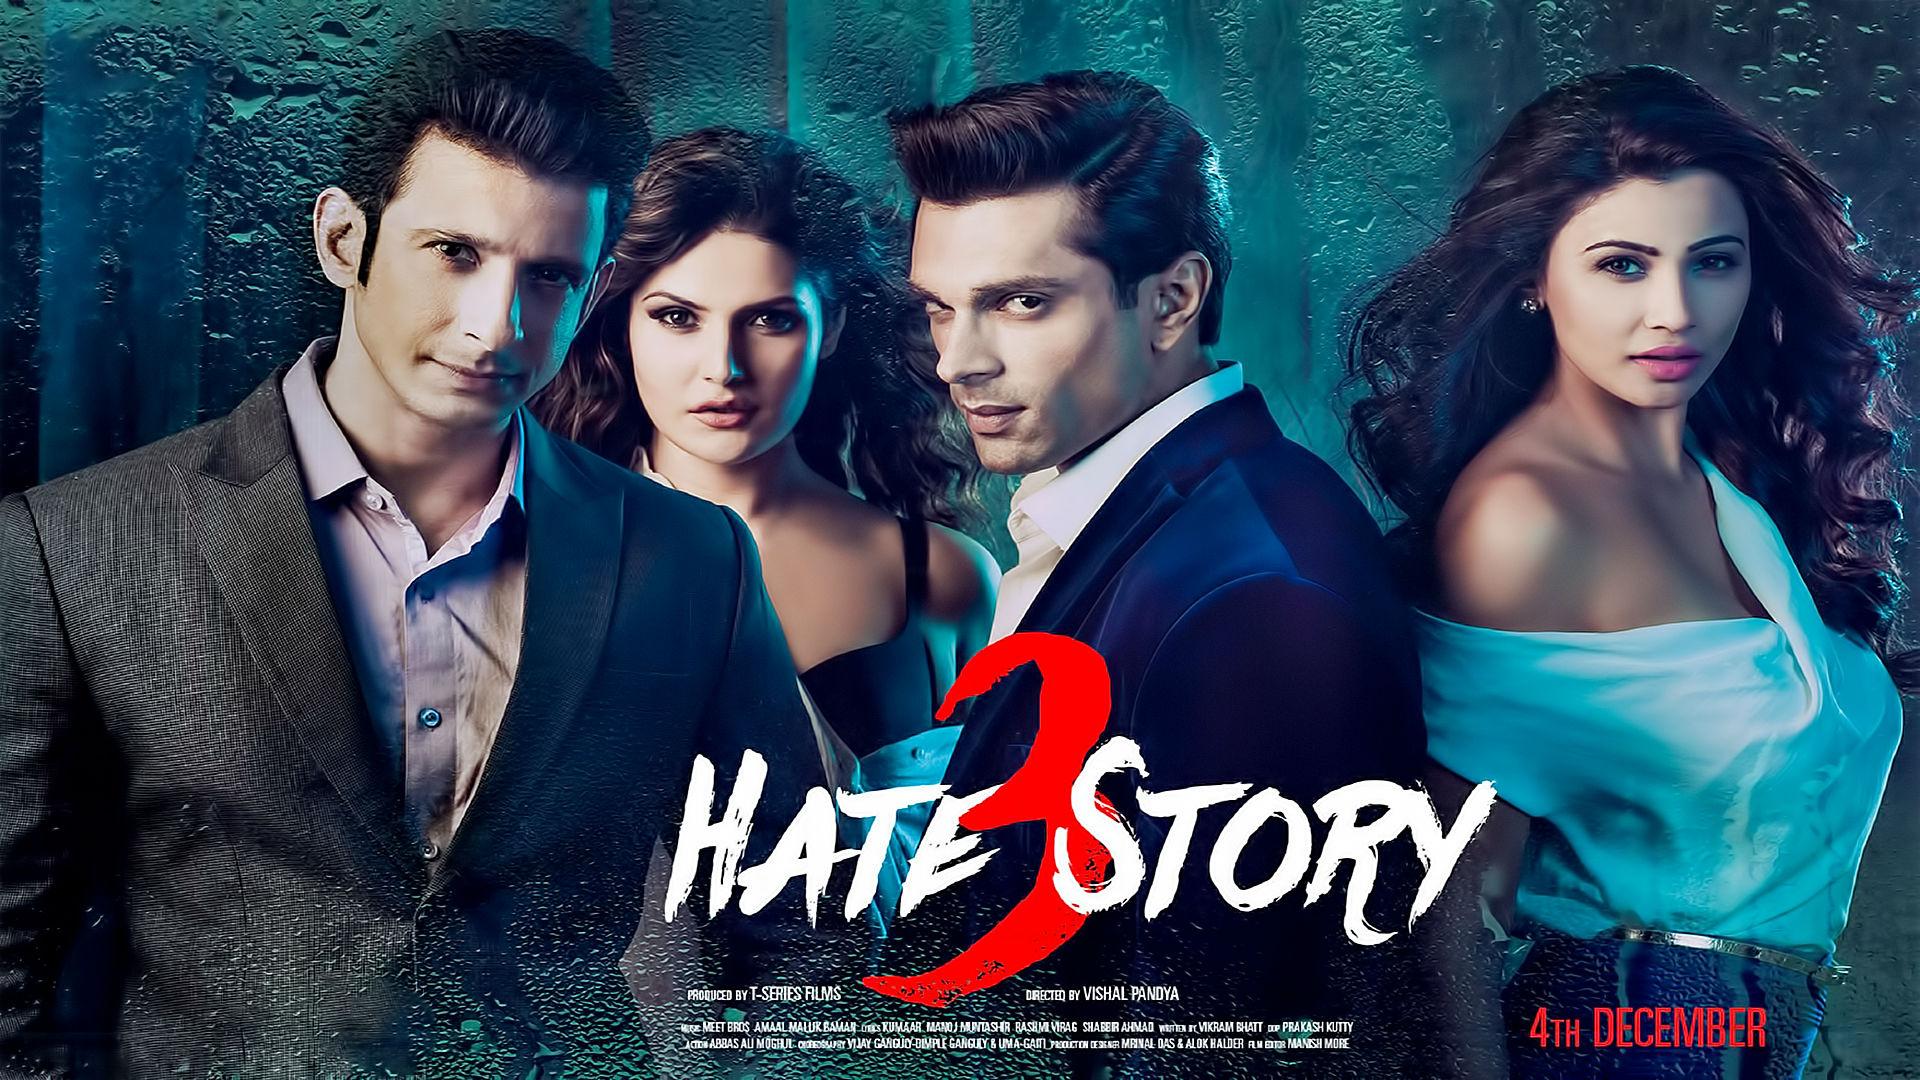 Hate Story 3 Movie Dialogues Poster Sharman Joshi, Zarine Khan, Karan Singh Grover, Daisy Shah